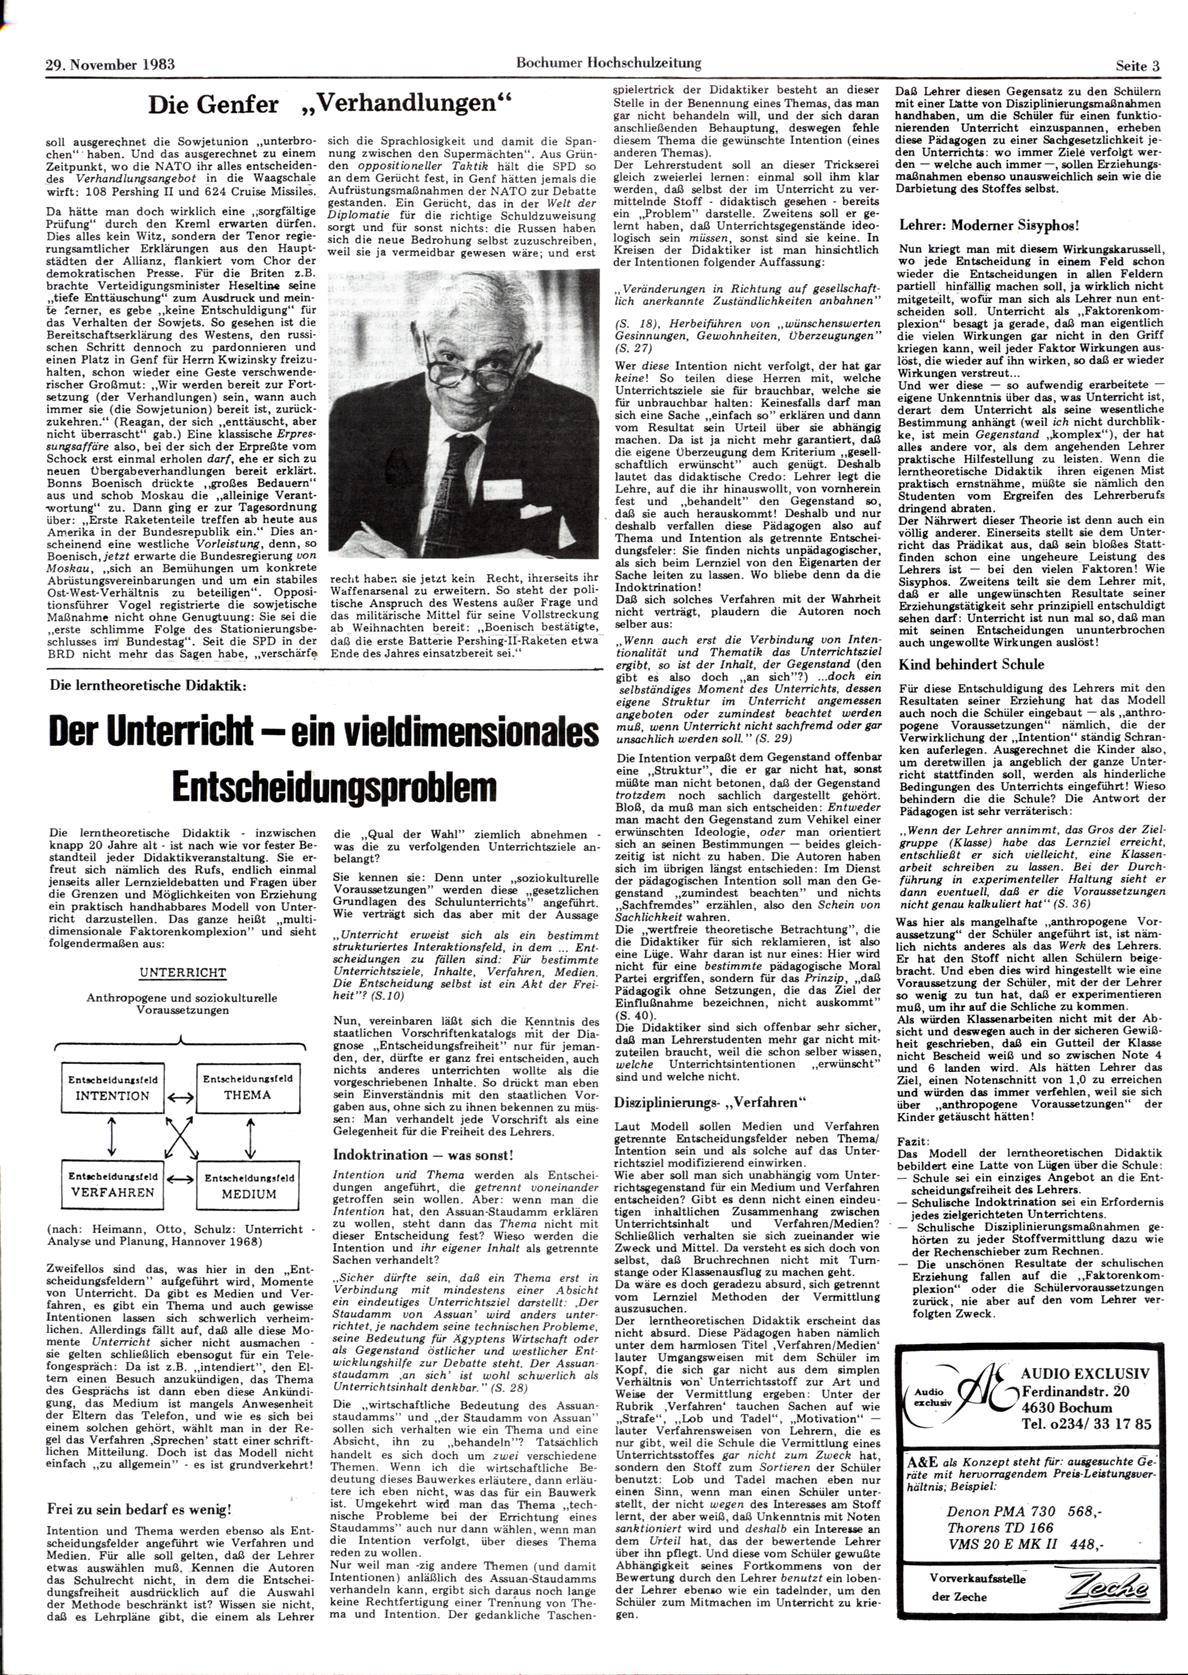 Bochum_BHZ_19831129_081_003